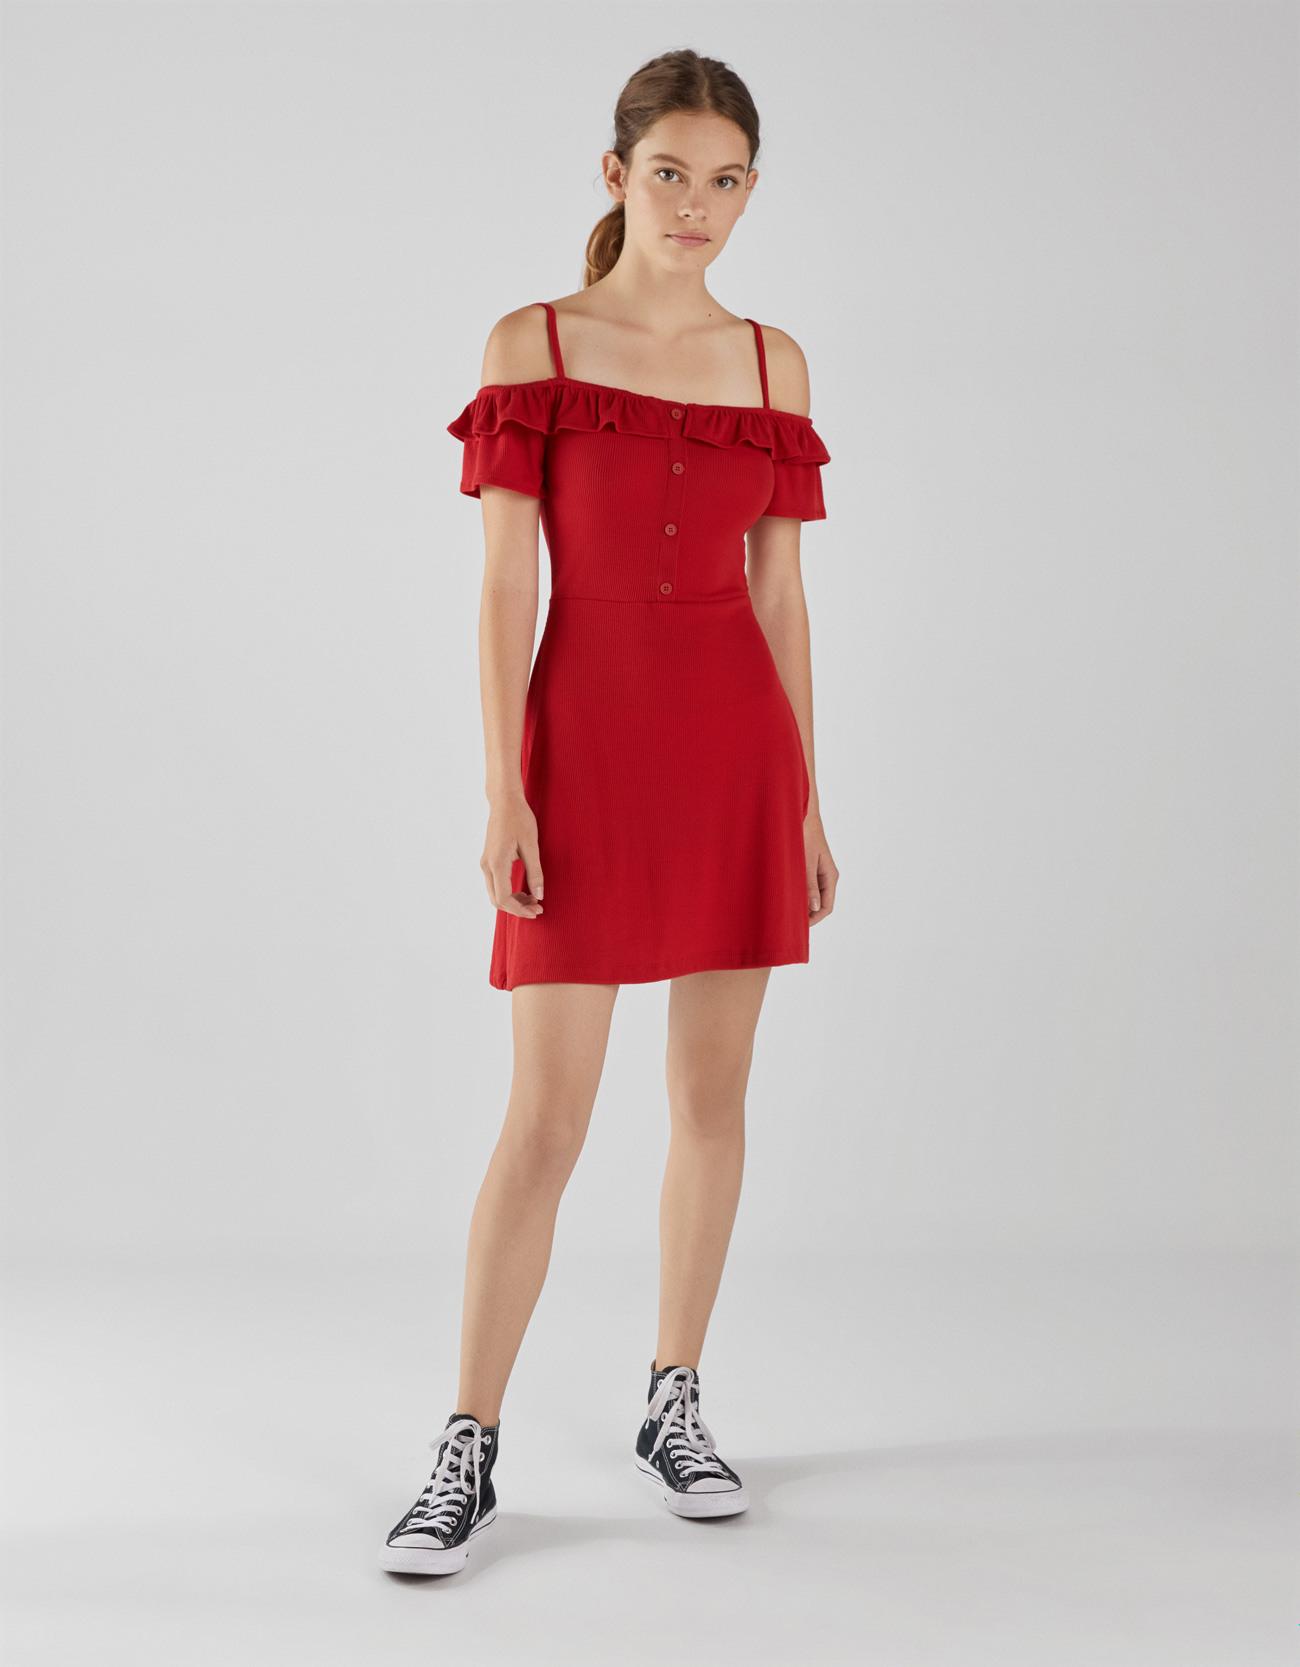 Kurzes Kleid Mit Volants  Kleider  Bershka Germany